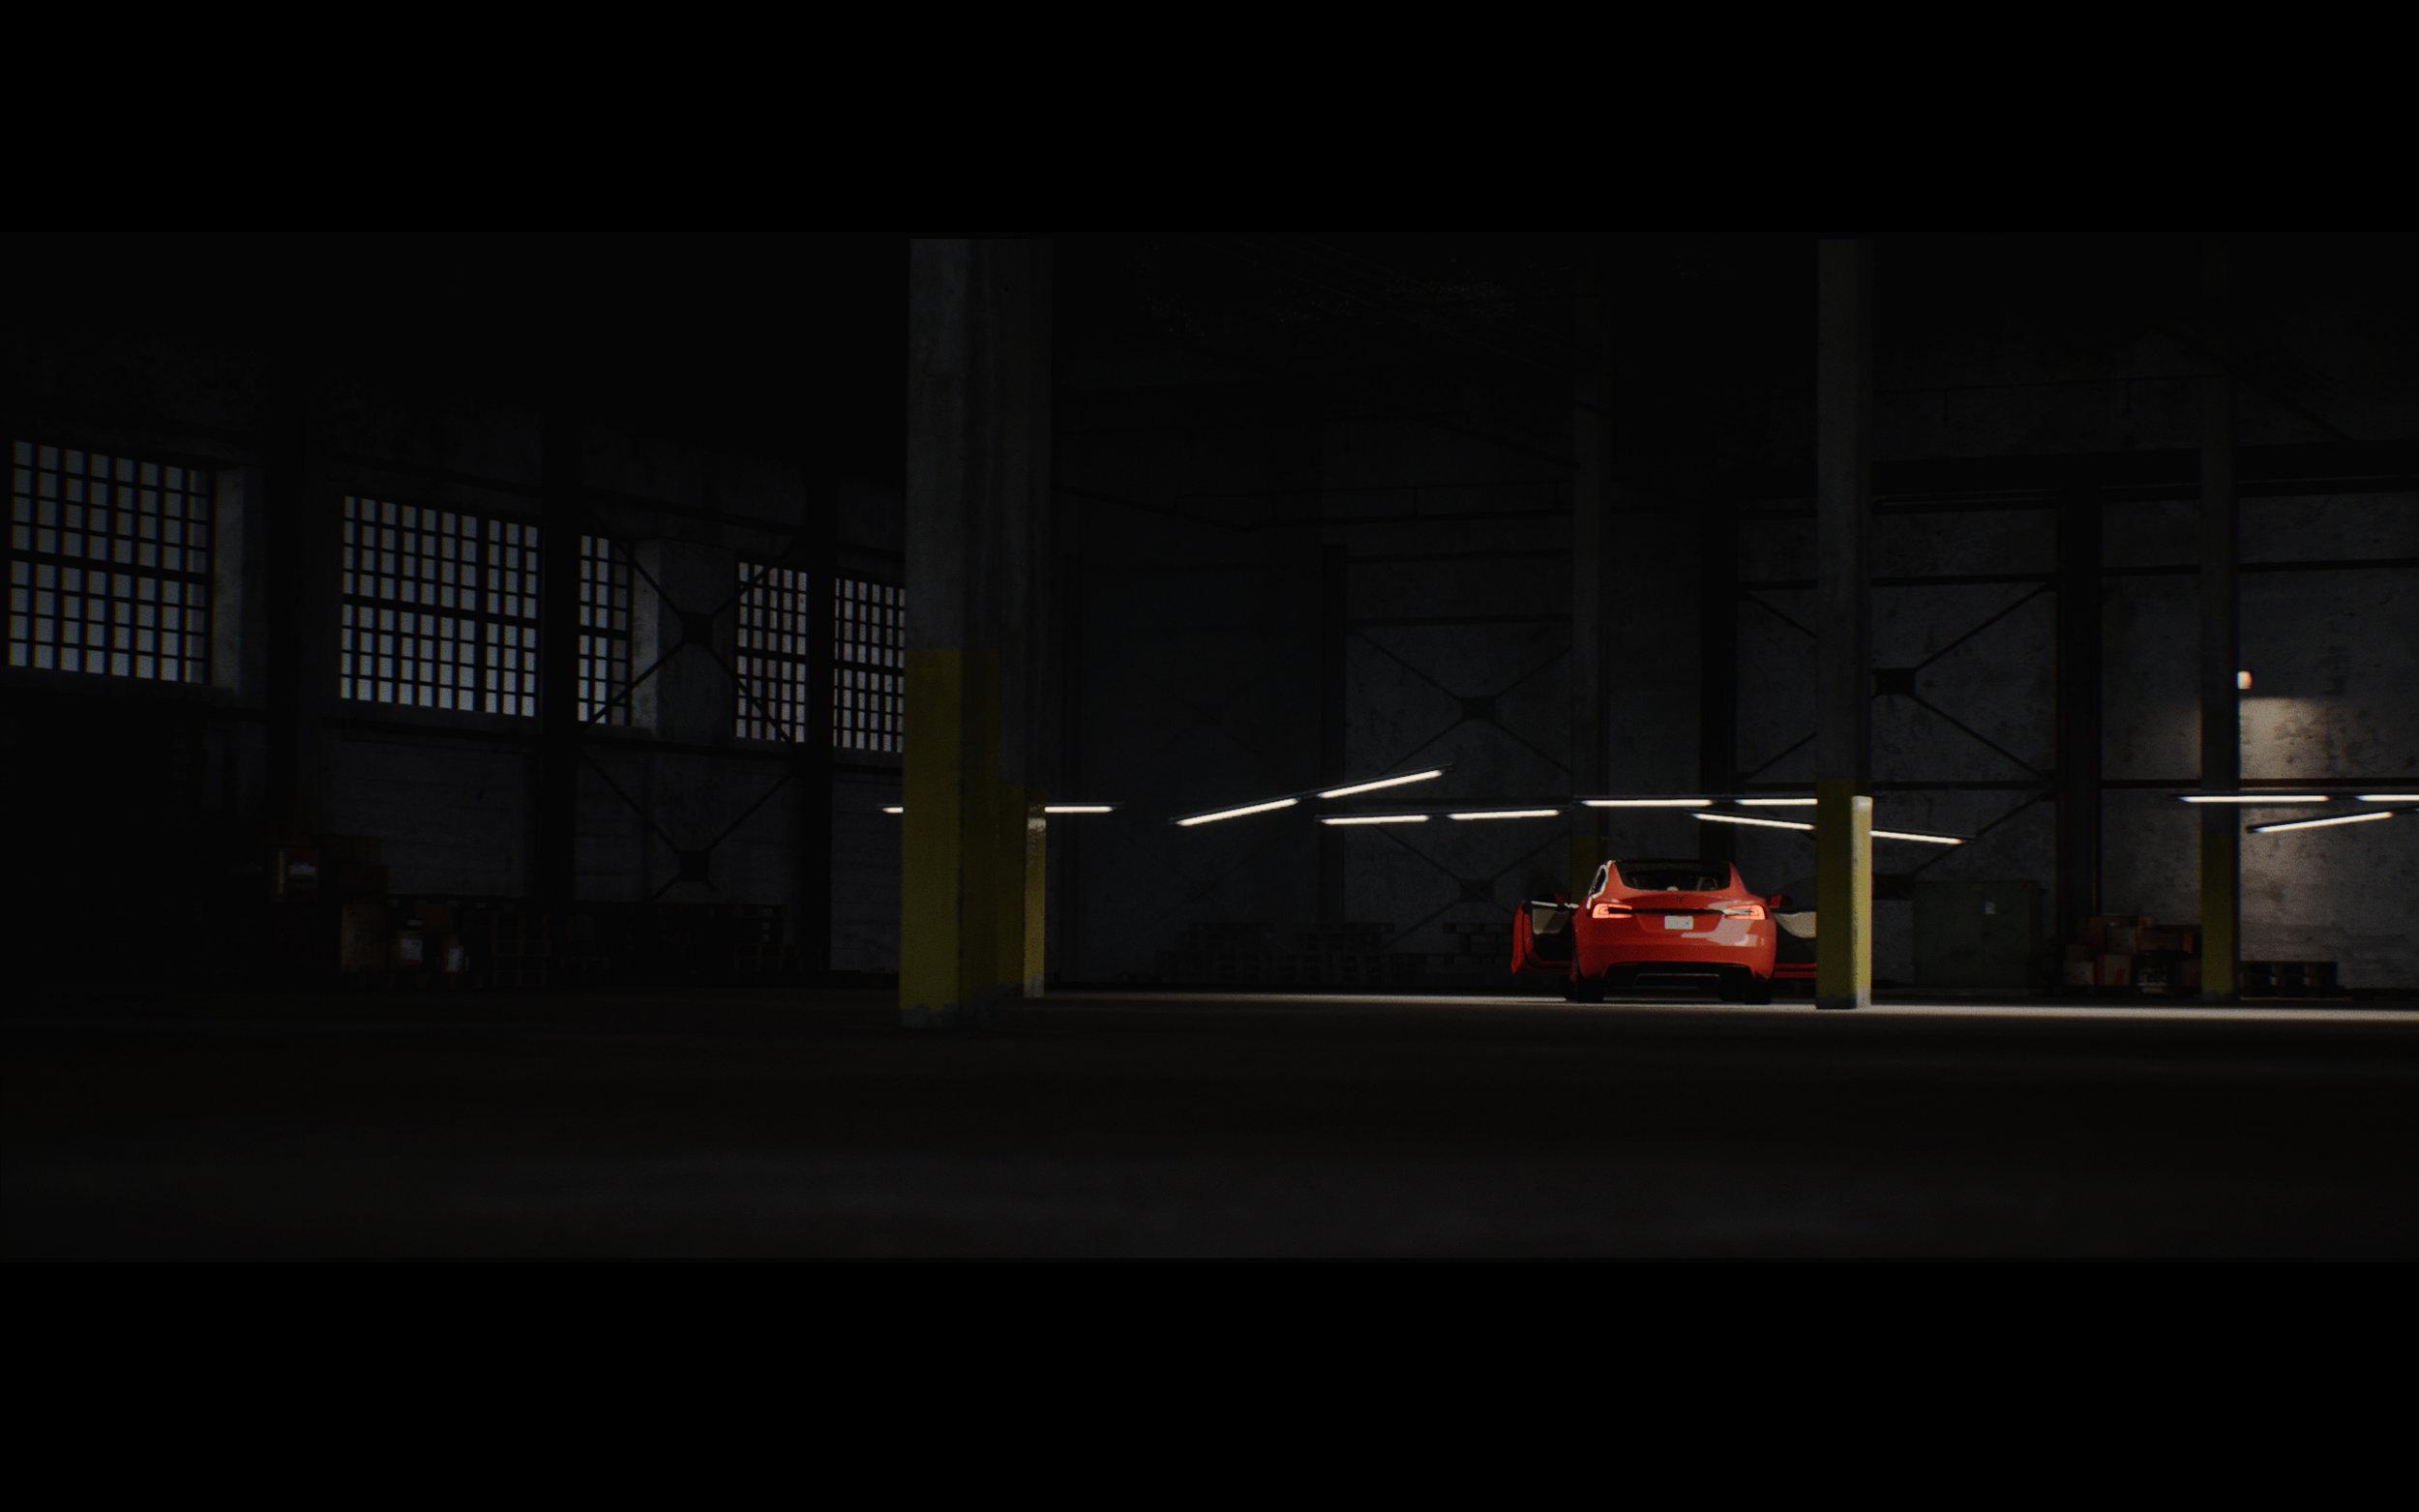 Warehouse_01.jpg